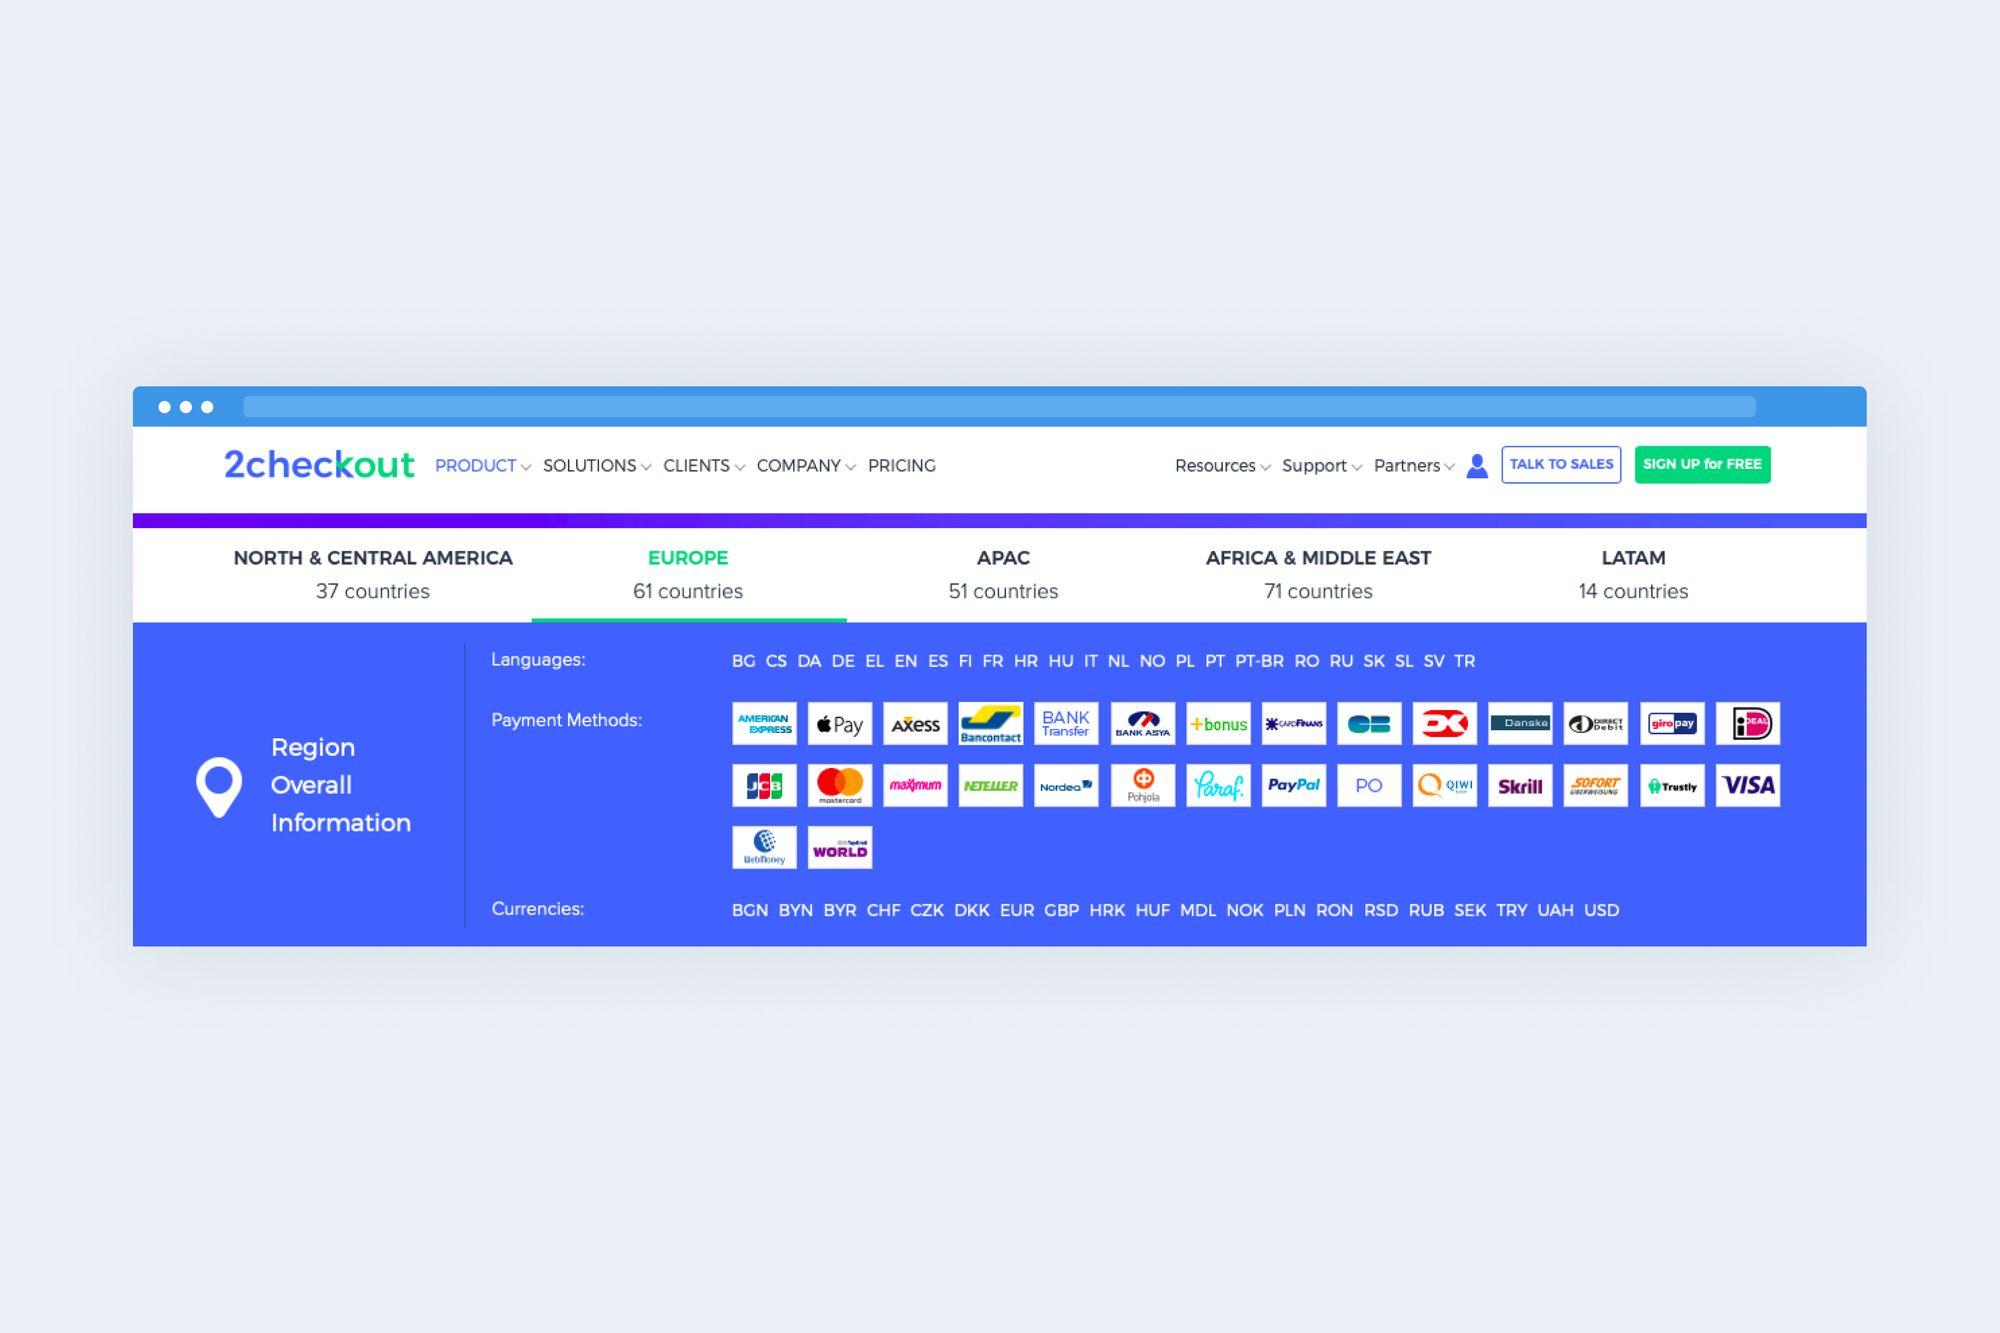 Region Overal Payment Methods Information